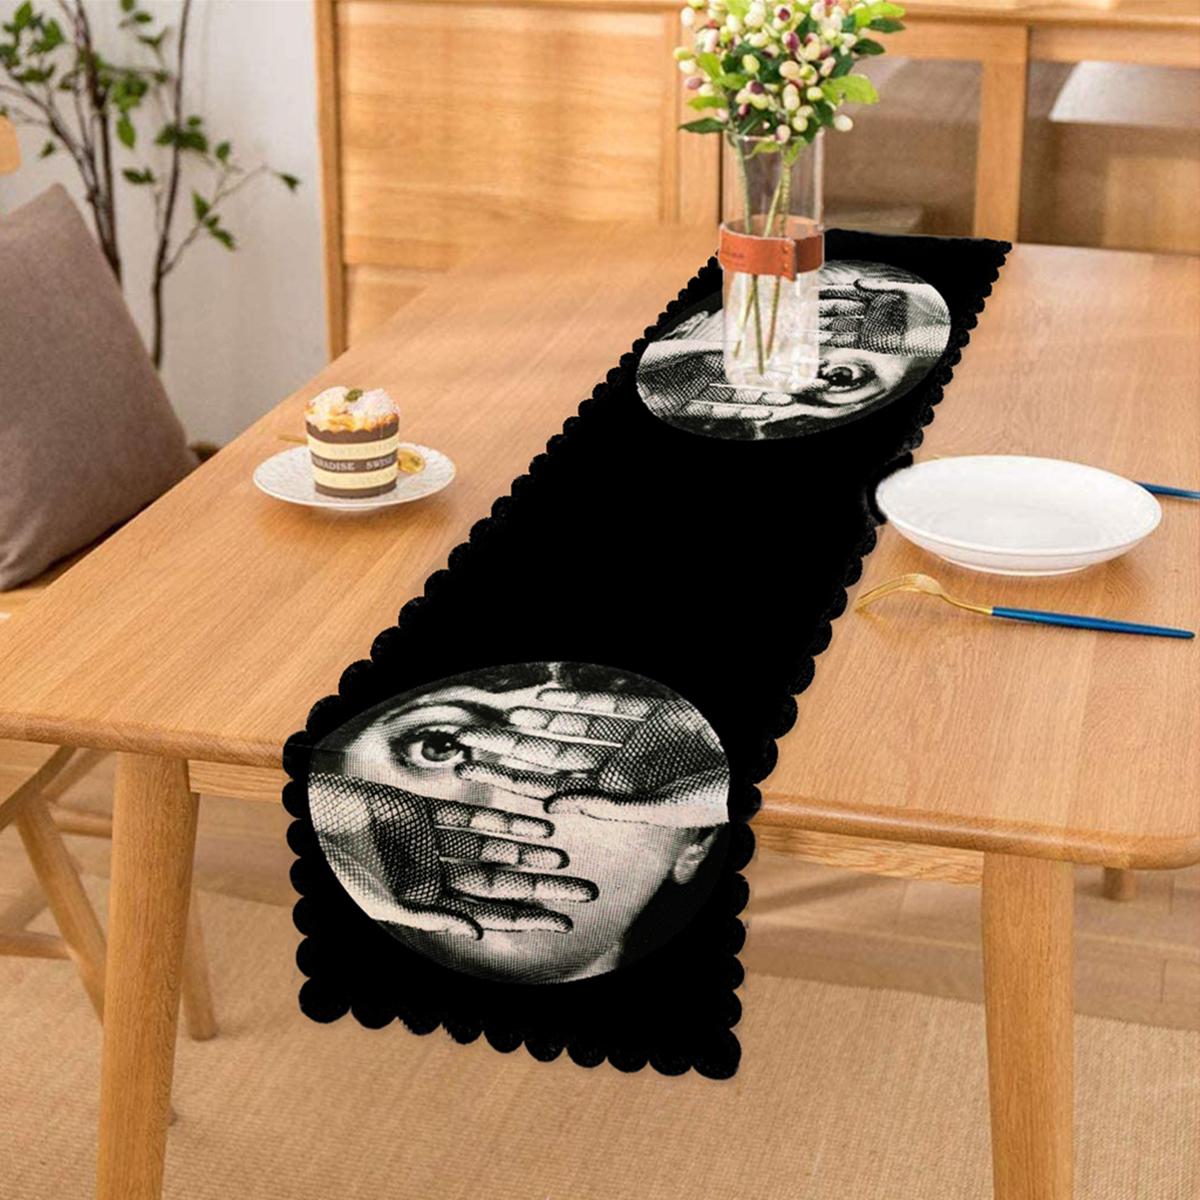 Siyah - Beyaz Fornosetti Tasarımlı Modern Dekoratif Runner Realhomes